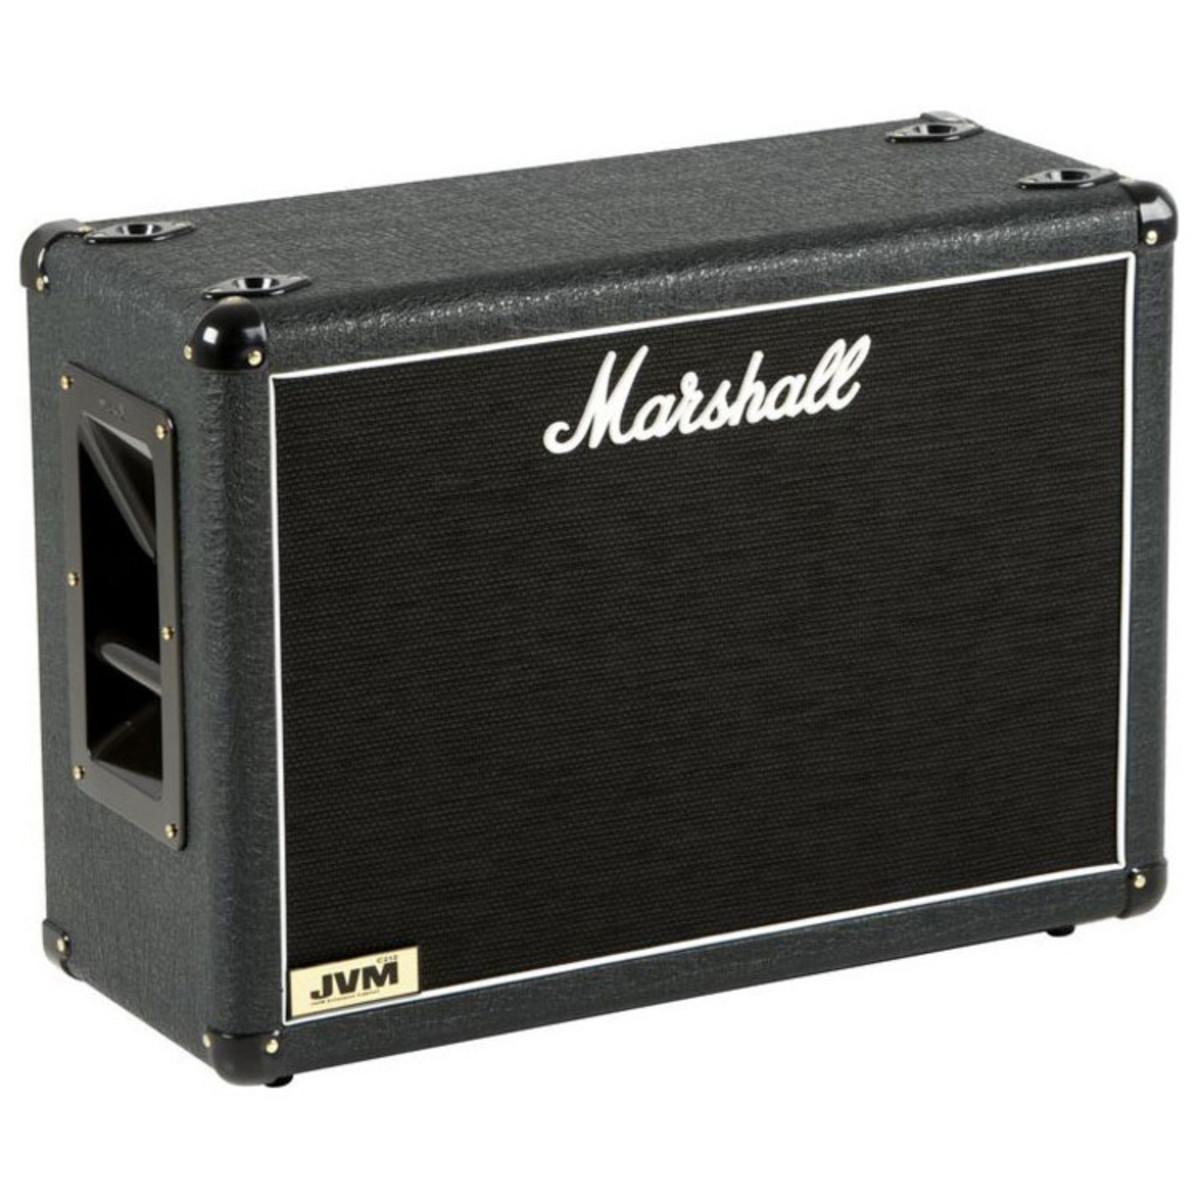 marshall jvmc212 guitar speaker cabinet box opened at. Black Bedroom Furniture Sets. Home Design Ideas